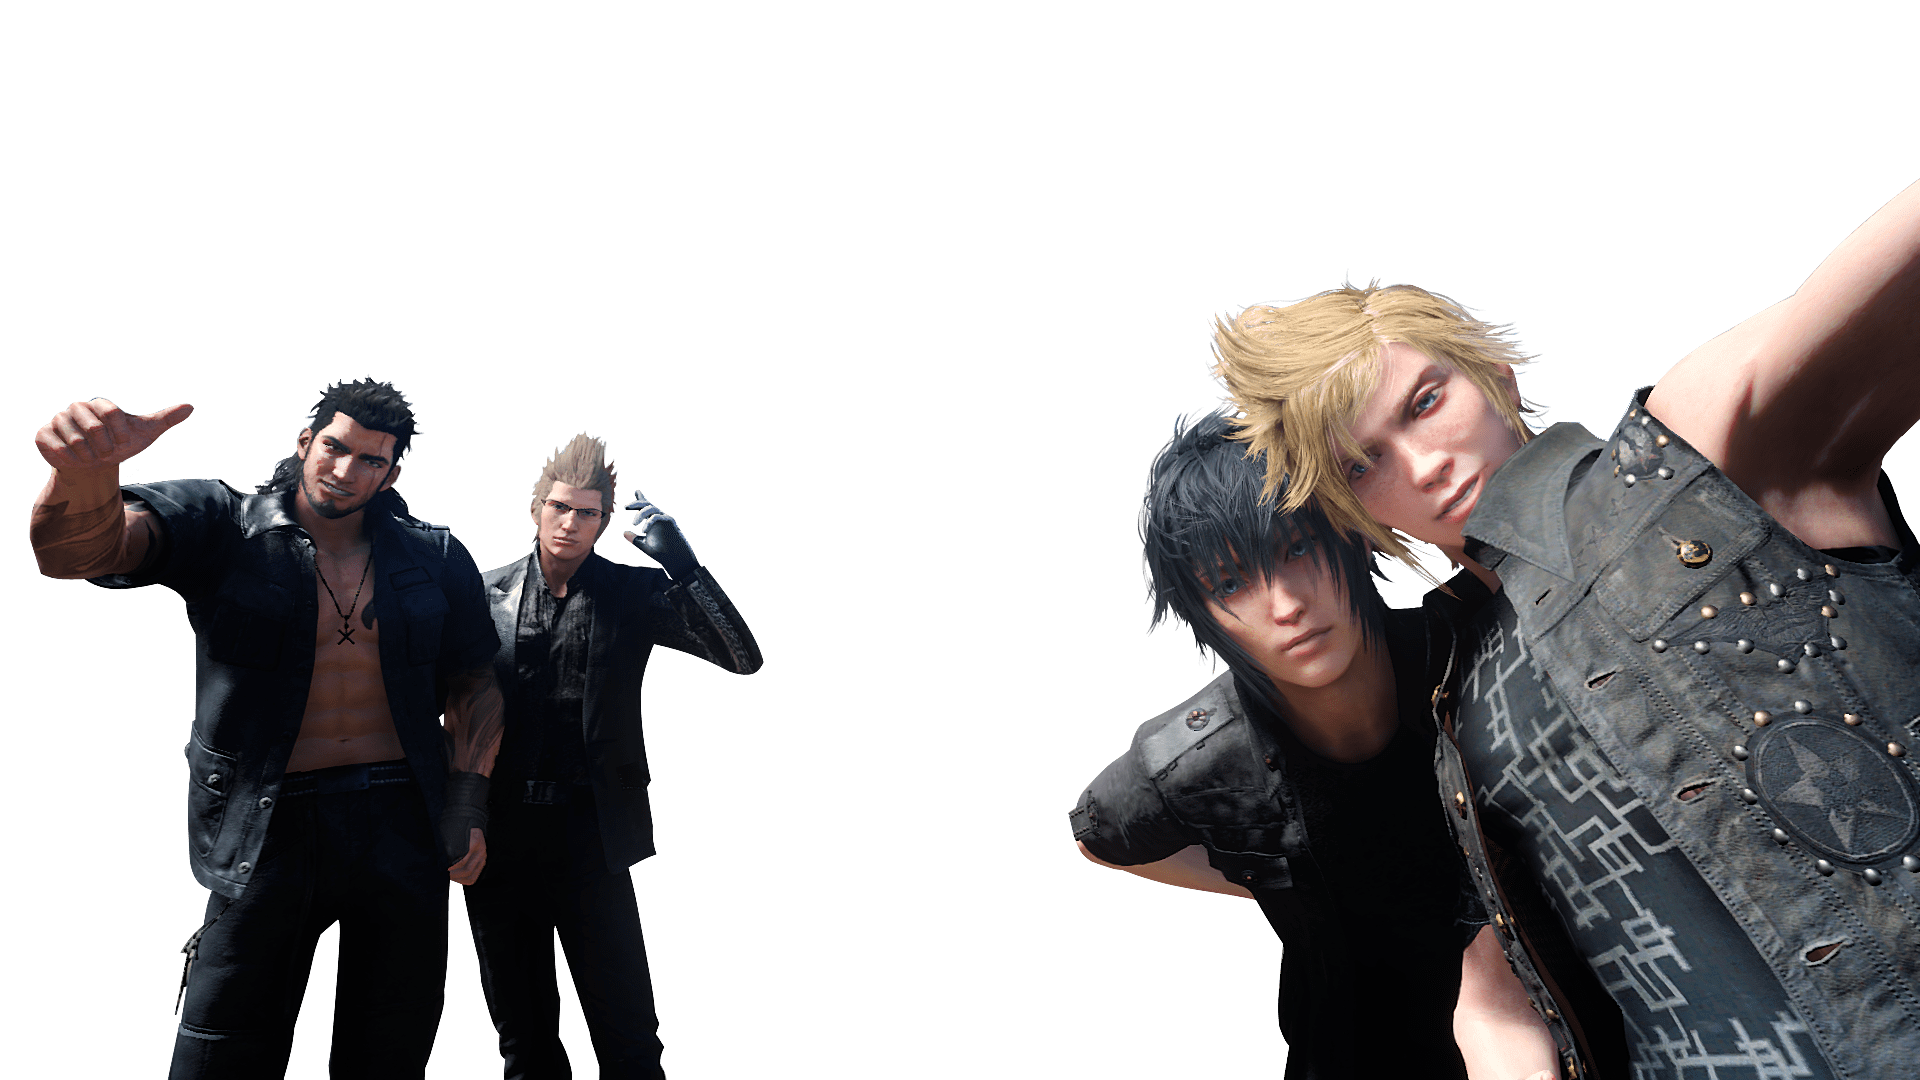 Wallpaper Final Fantasy Xv Royal Edition 2018 Games 12556: Community